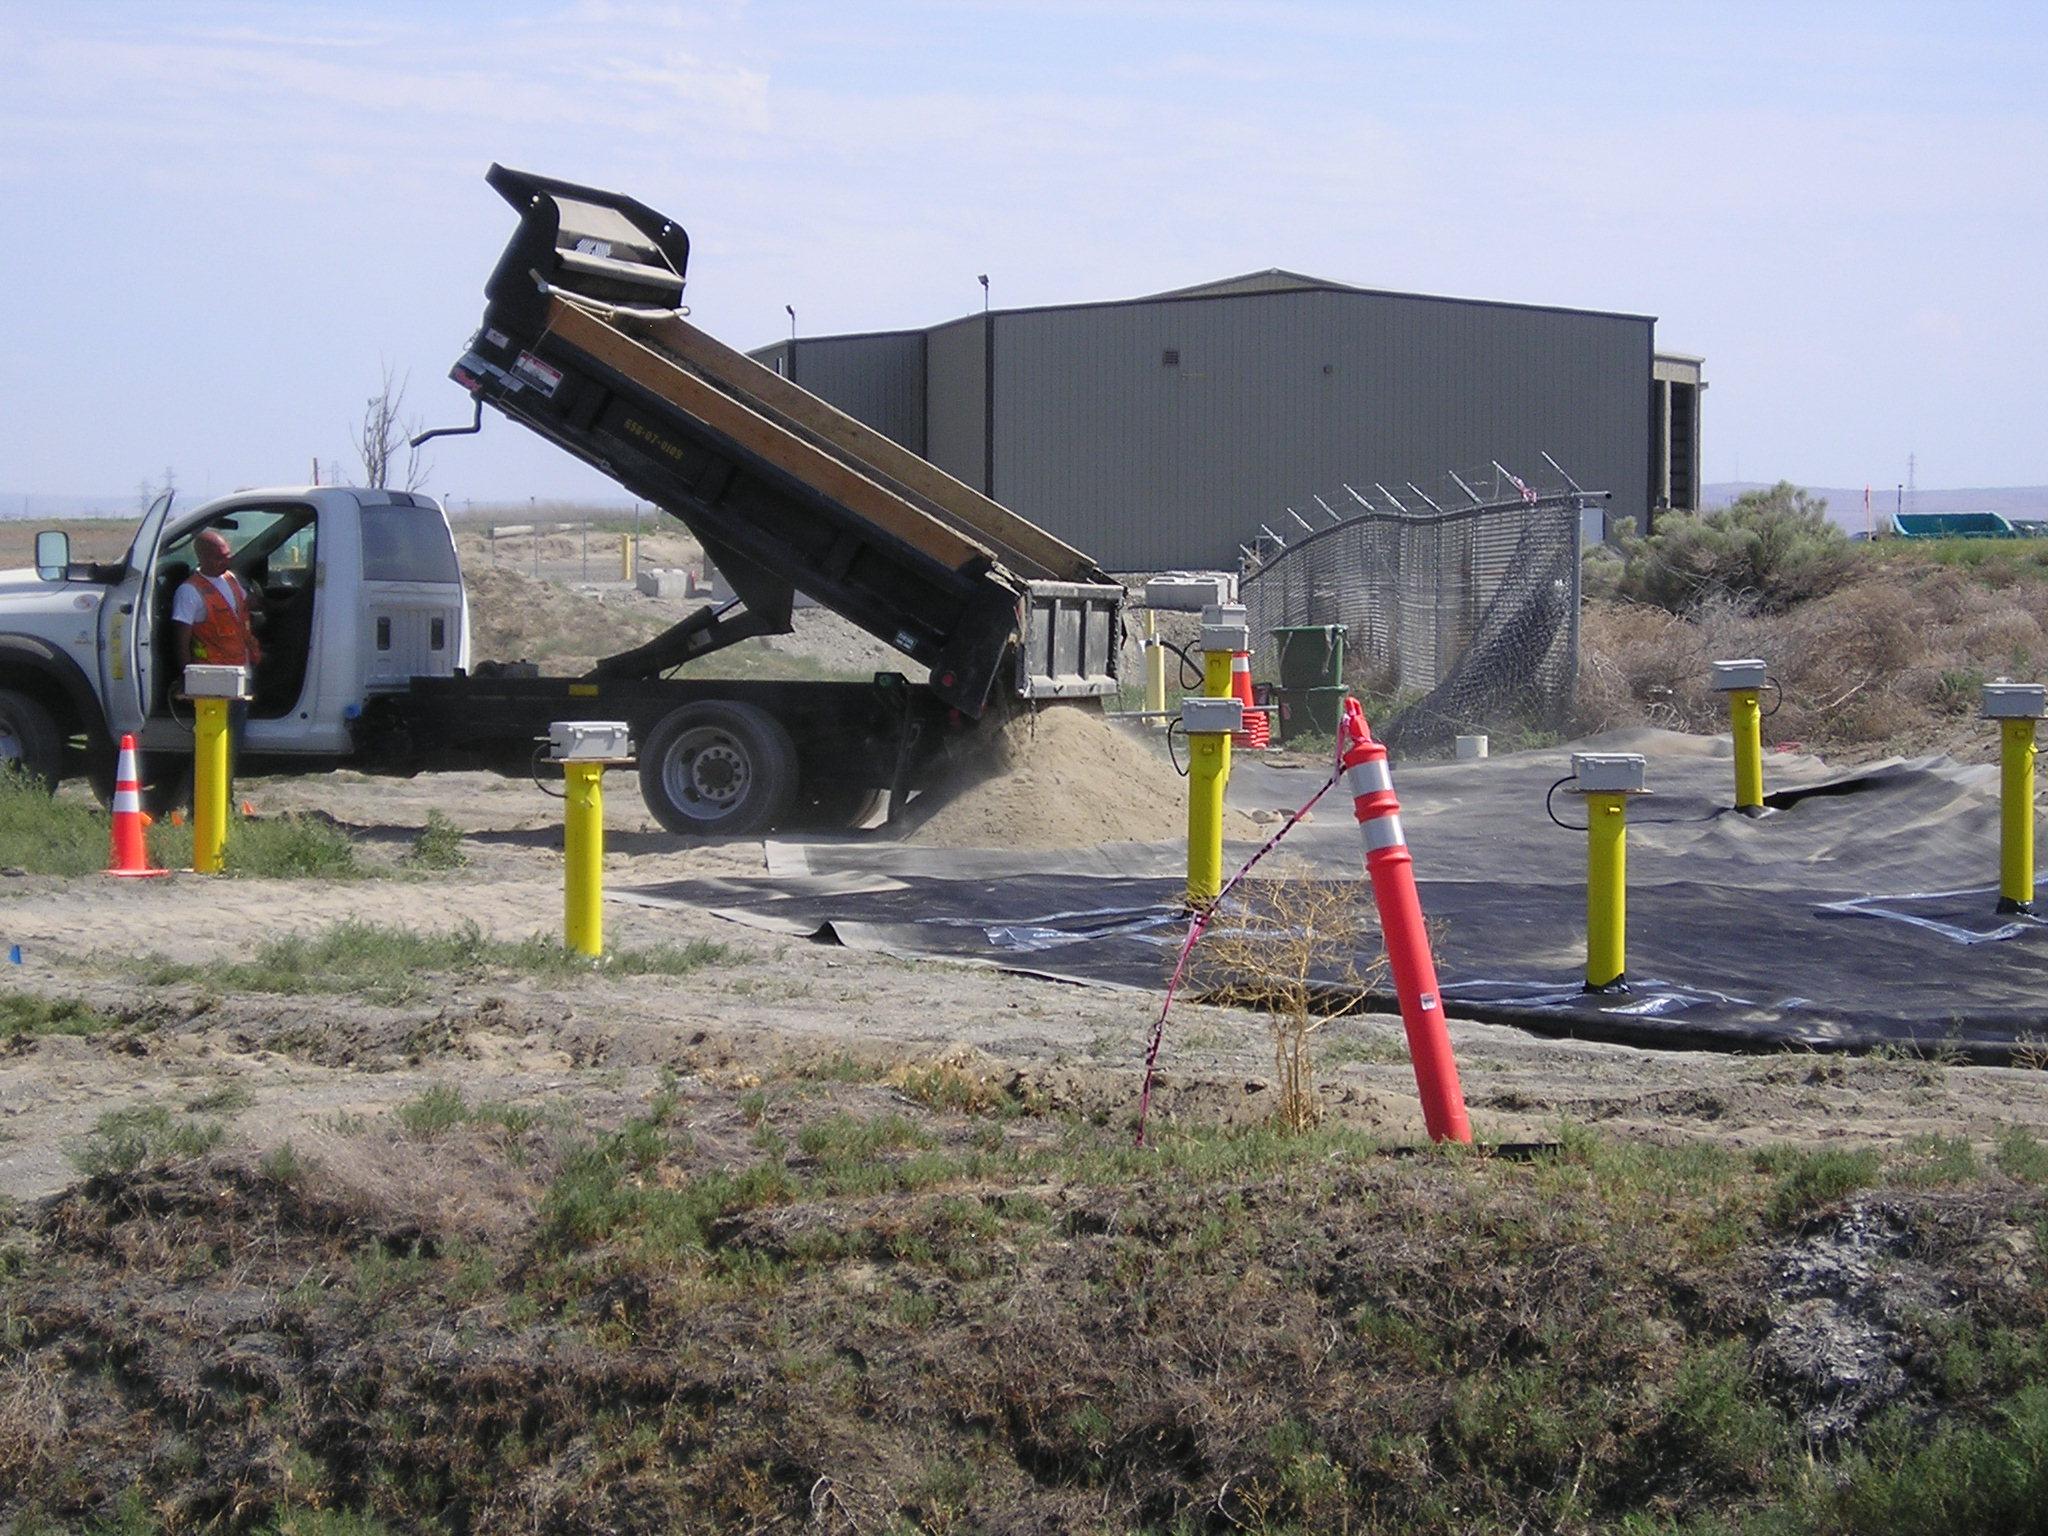 2014-06-02.20 - Placing Soil on HDPE.01.JPG